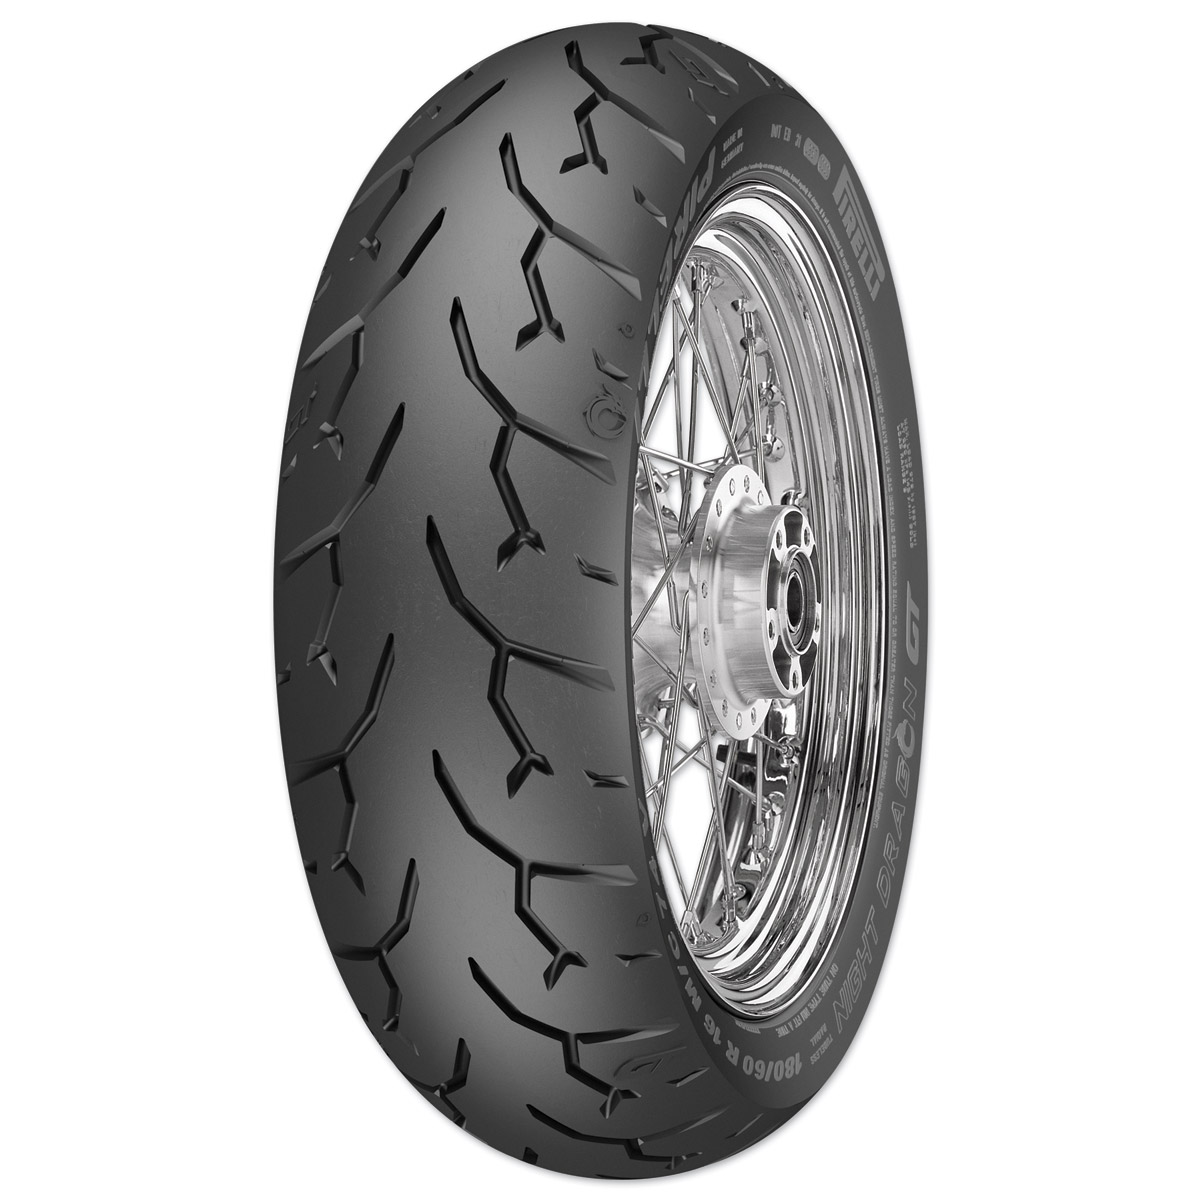 Pirelli Night Dragon GT 200/55R17 Rear Tire